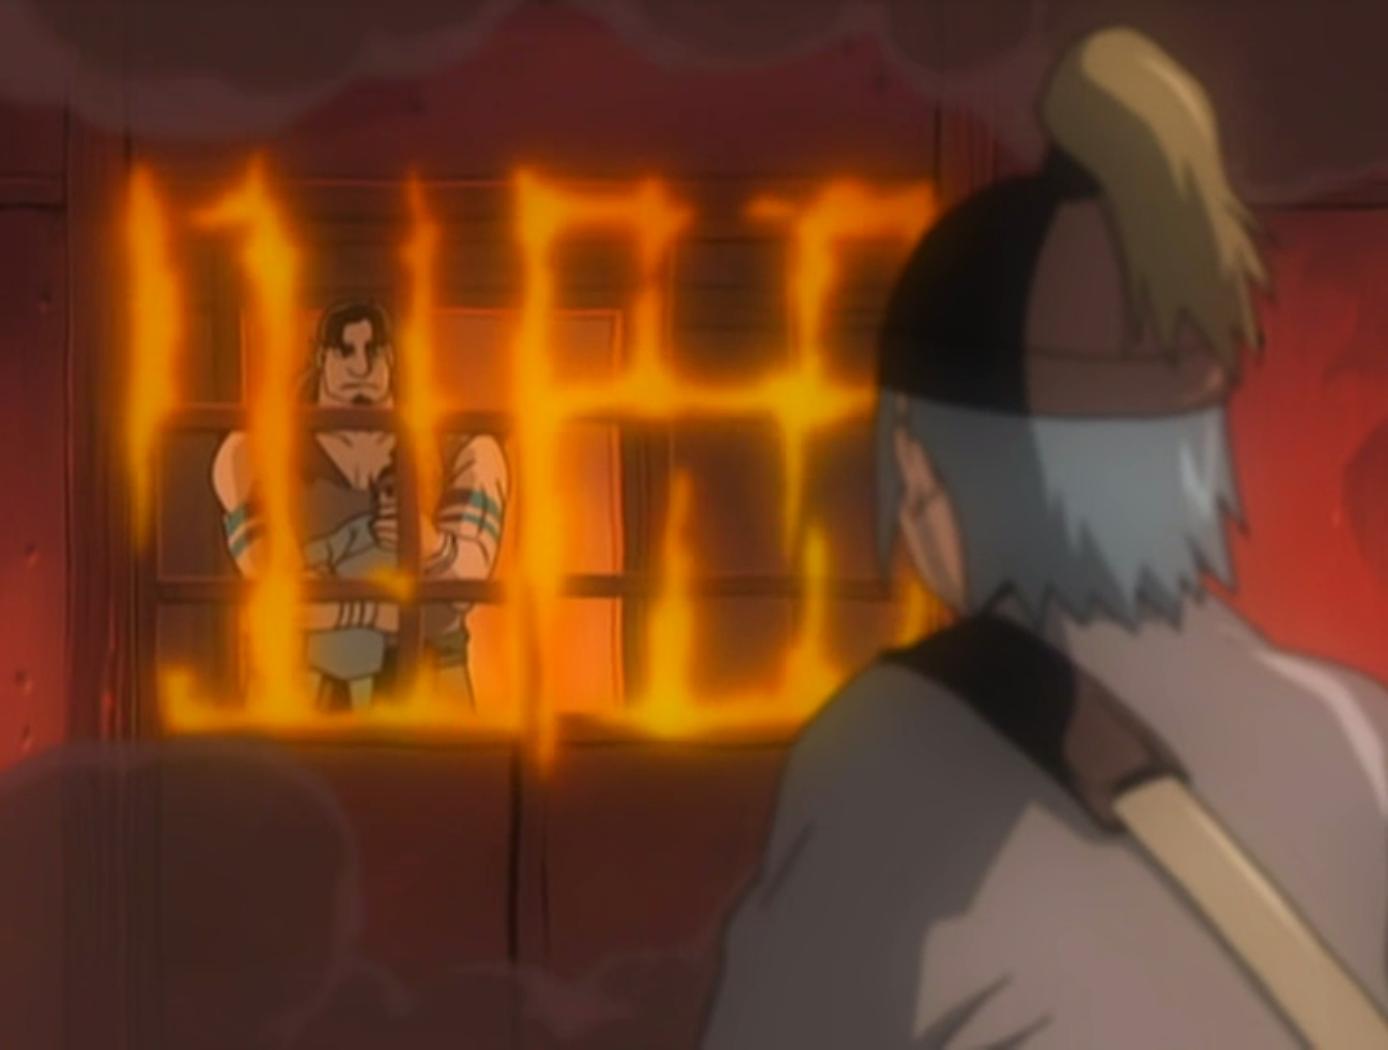 Naruto - Episódio 211: Recordações das Chamas